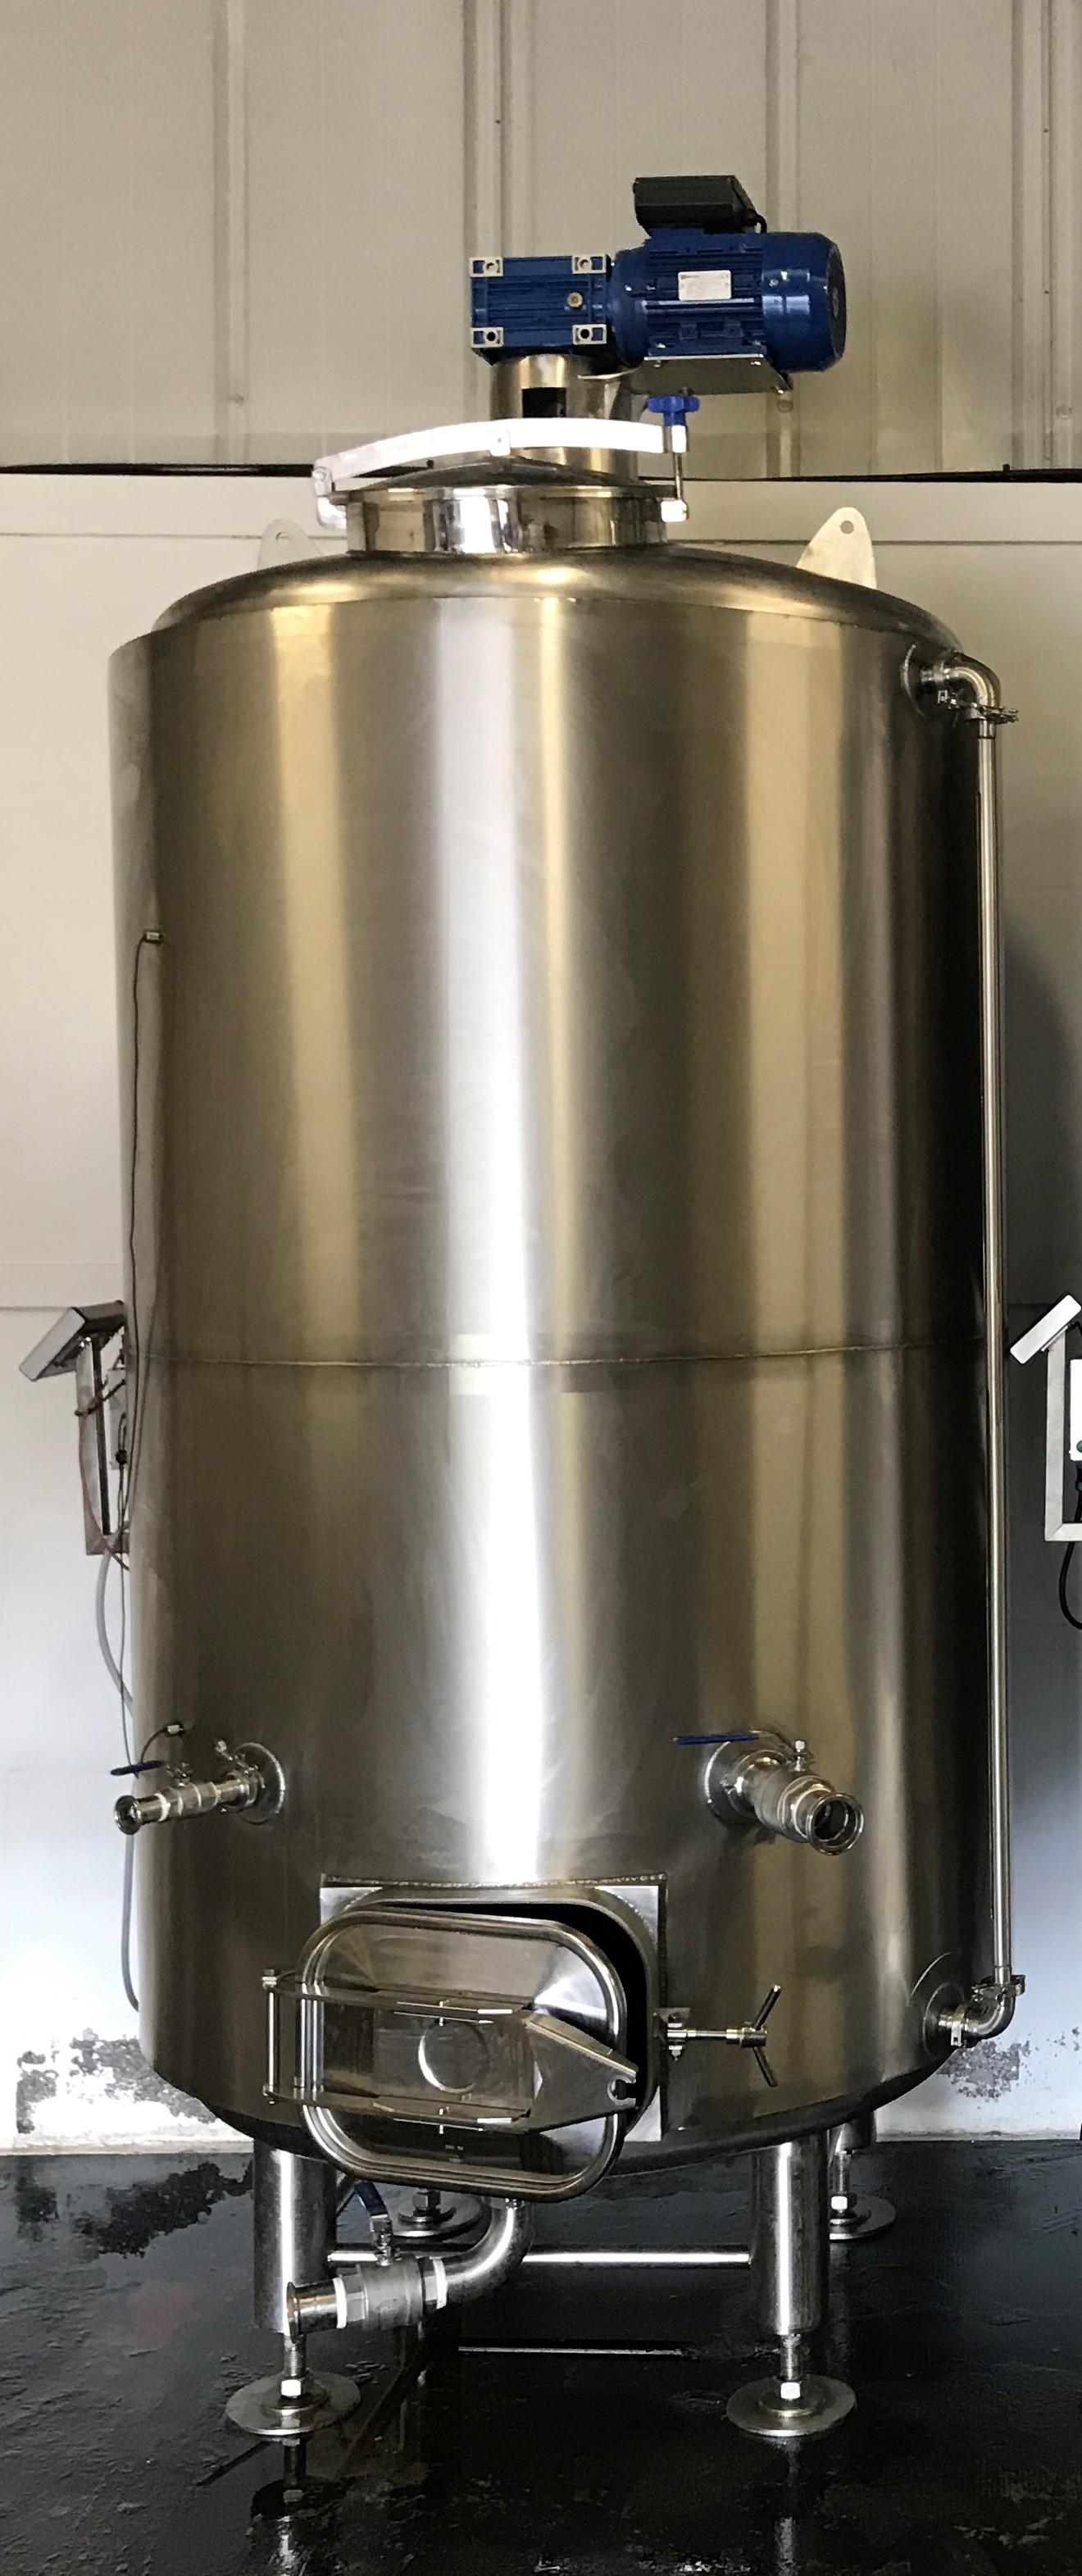 2,000 Litre, Atmospheric Internal, 3 Bar Jacket, Stainless Steel Vertical Fermenter Vessel